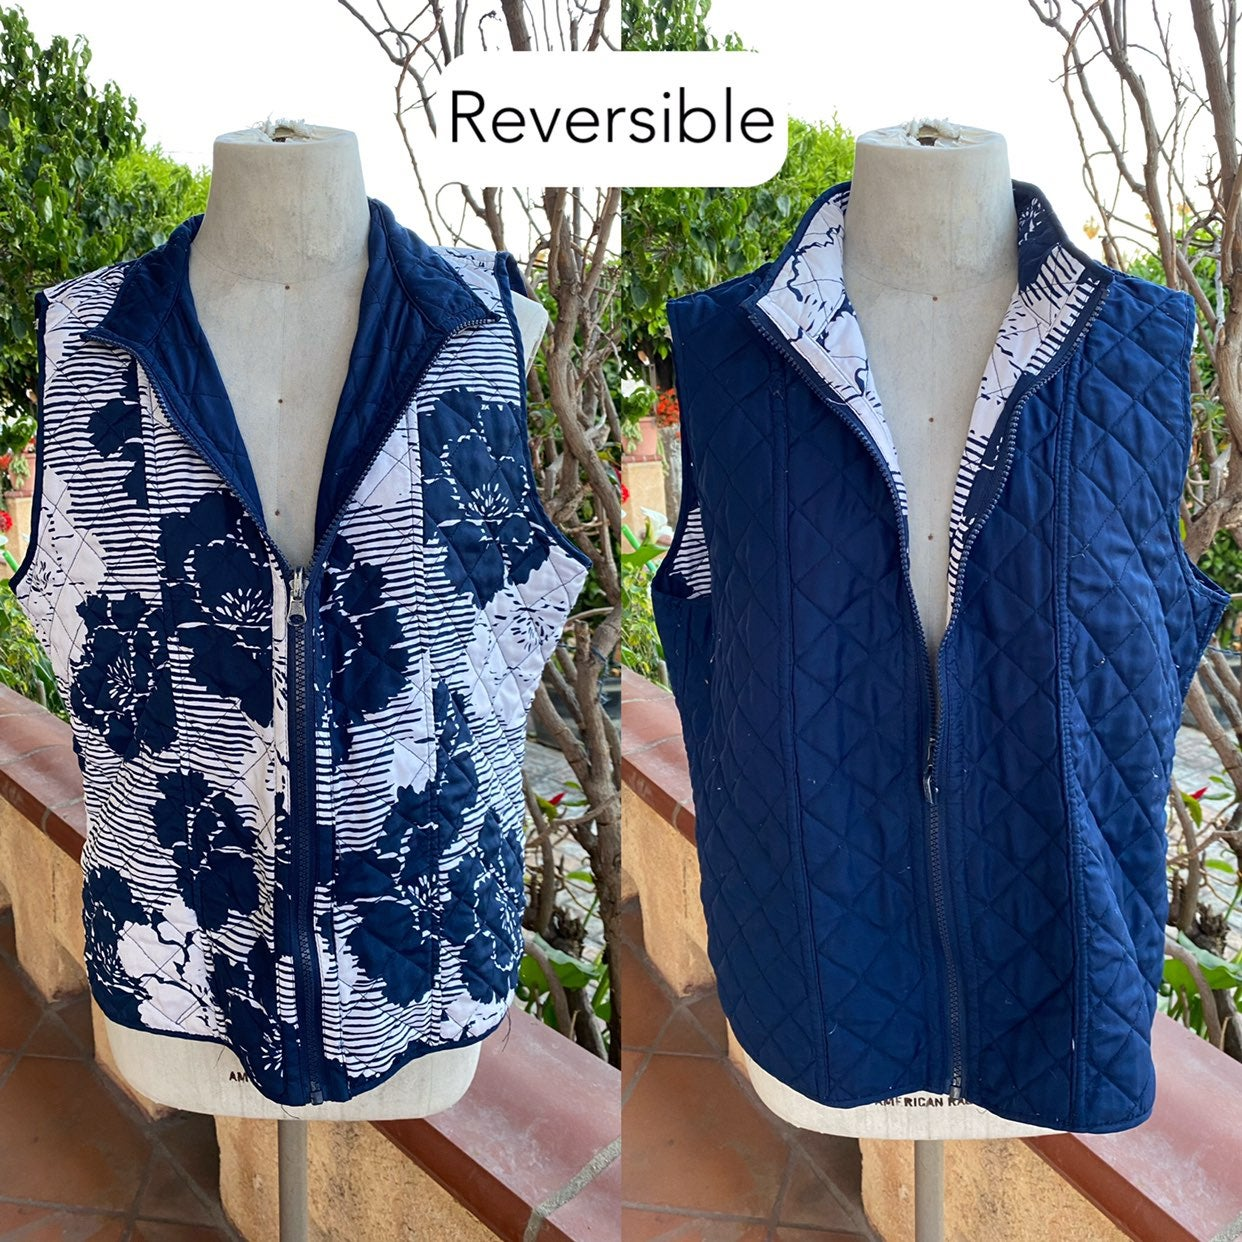 Alfred Dunner Reversible Vest